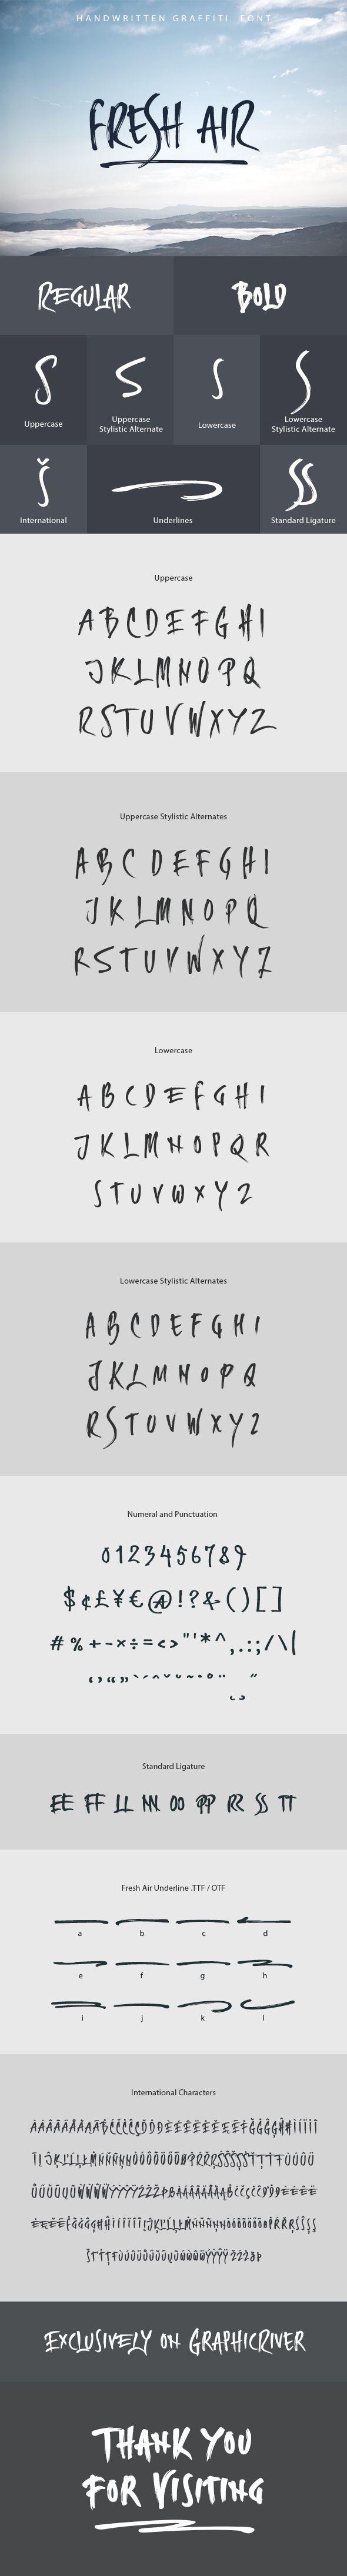 Fresh Air Handwritten Graffiti #Font - #Hand-writing #Script Download here: https://graphicriver.net/item/fresh-air-handwritten-graffiti-font/20169566?ref=alena994